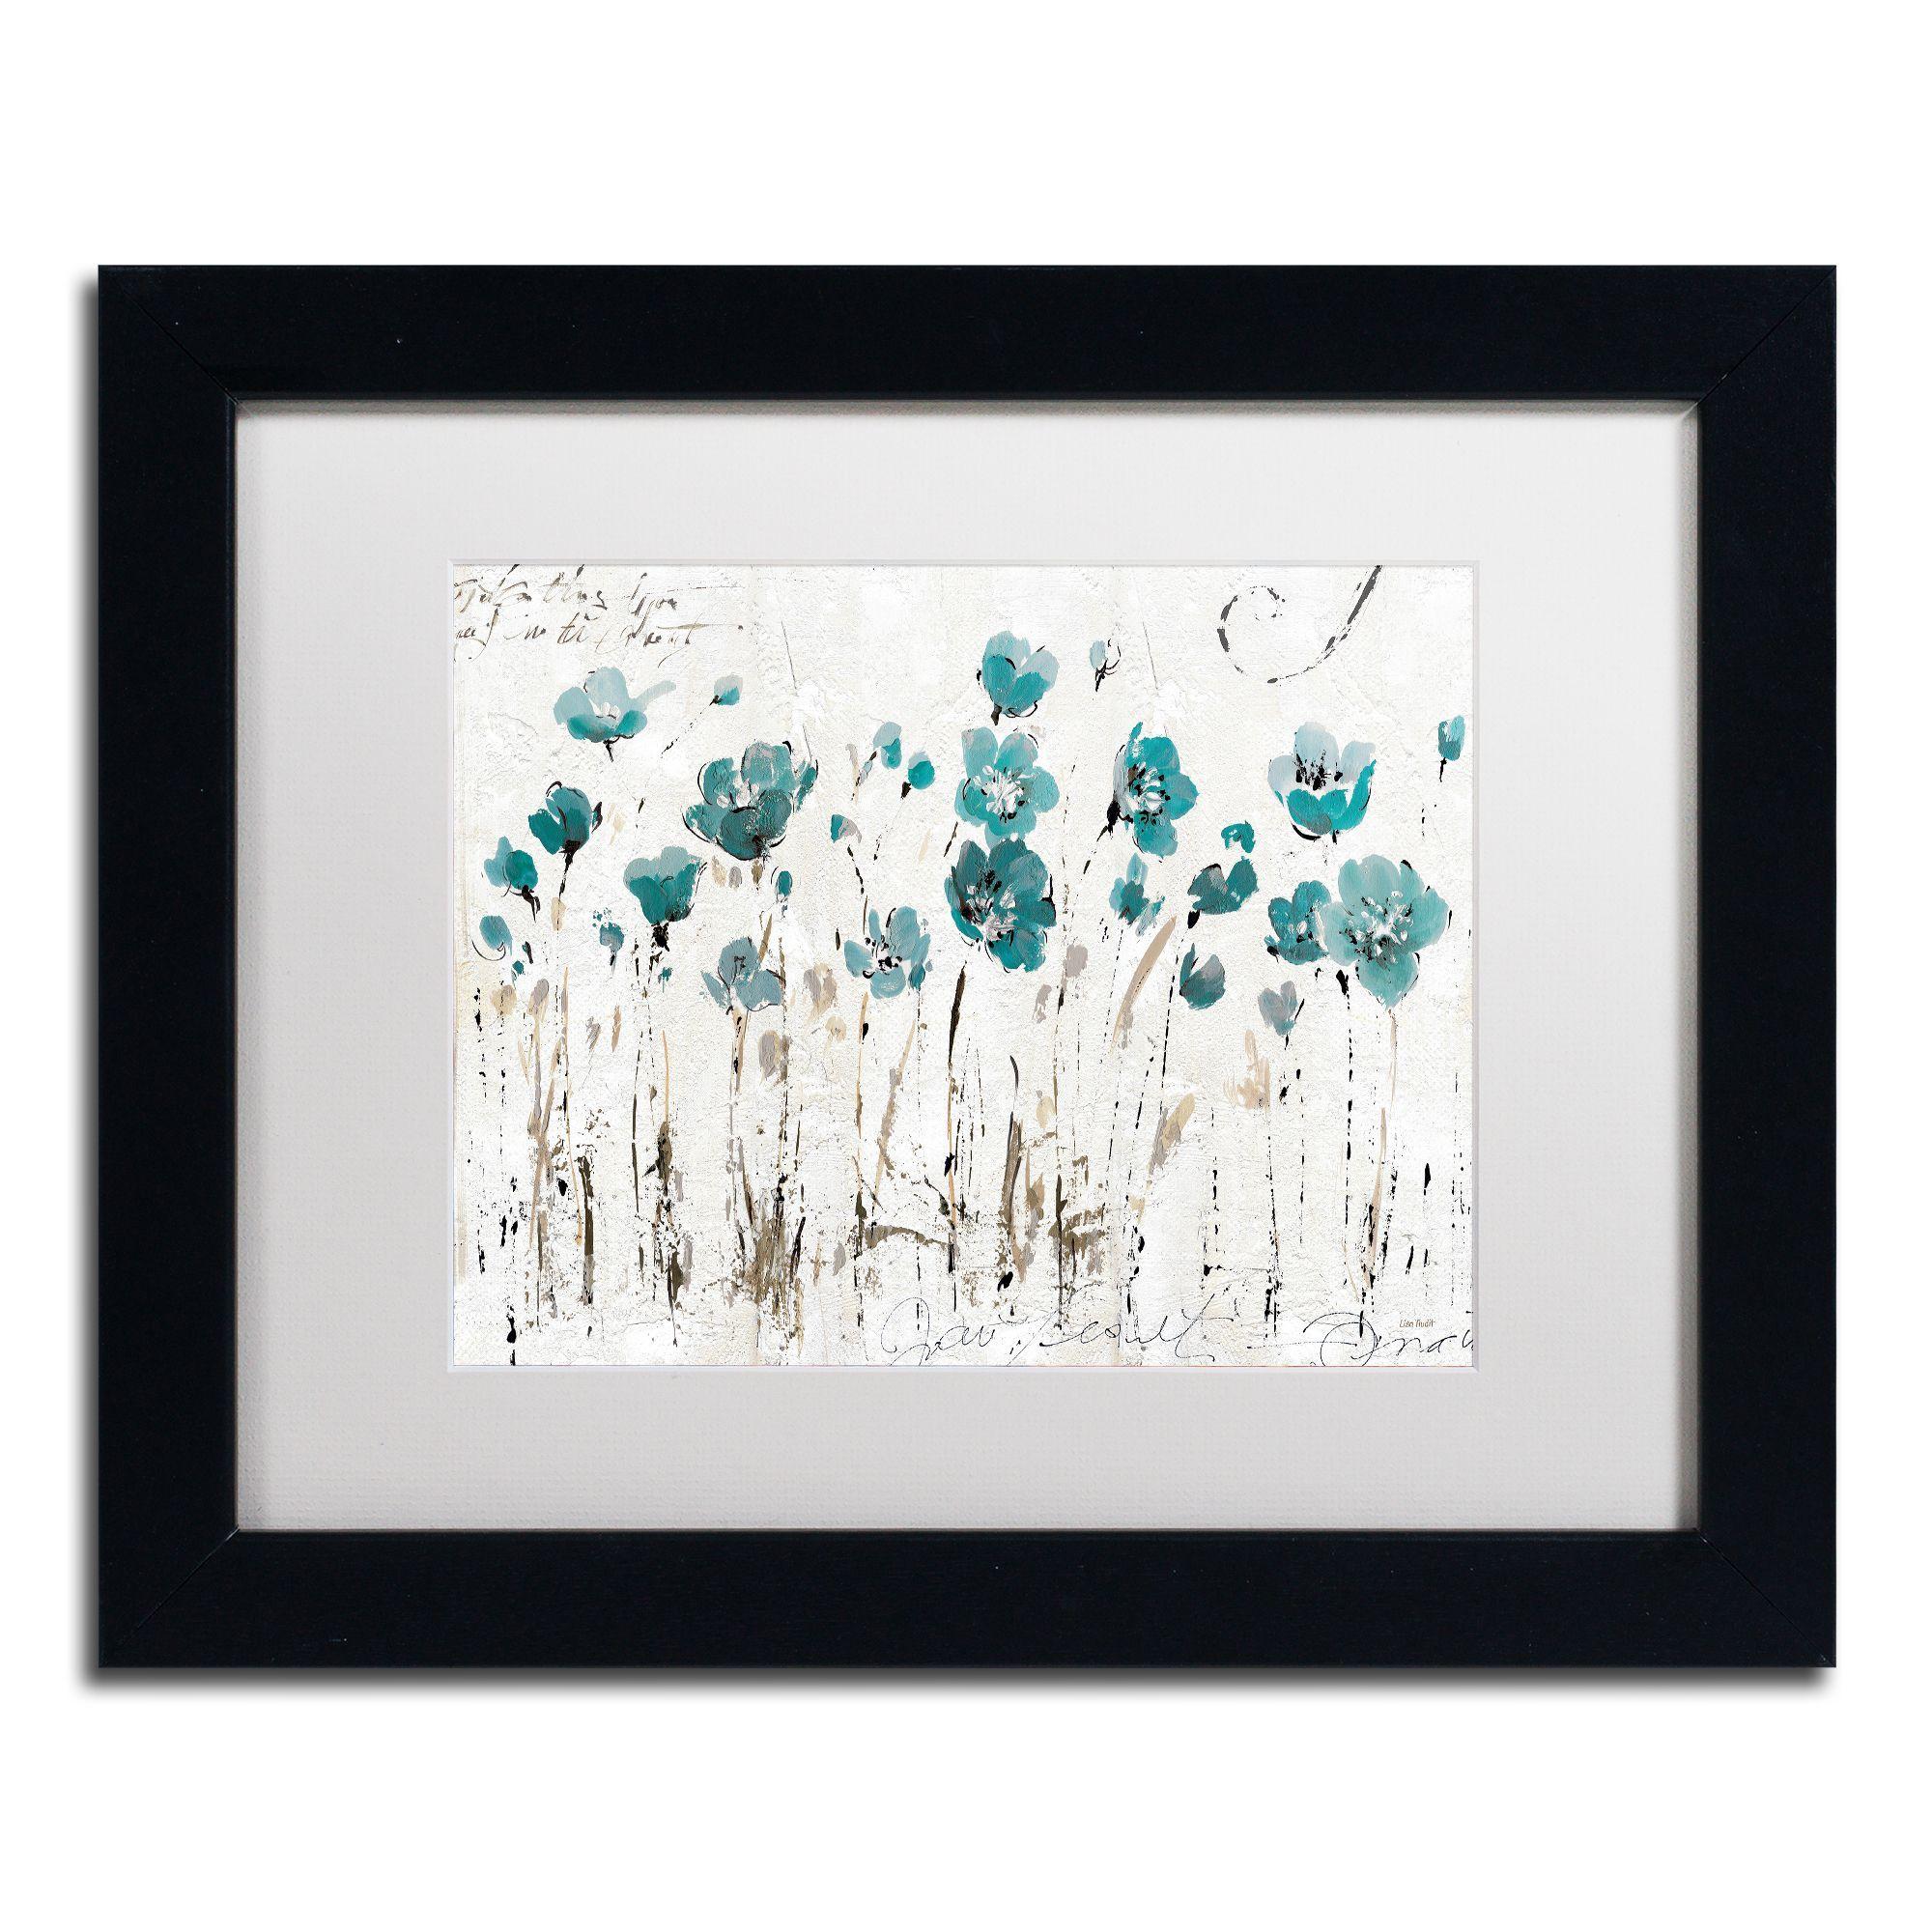 Lisa audit uabstract balance vi blueu matted framed art products